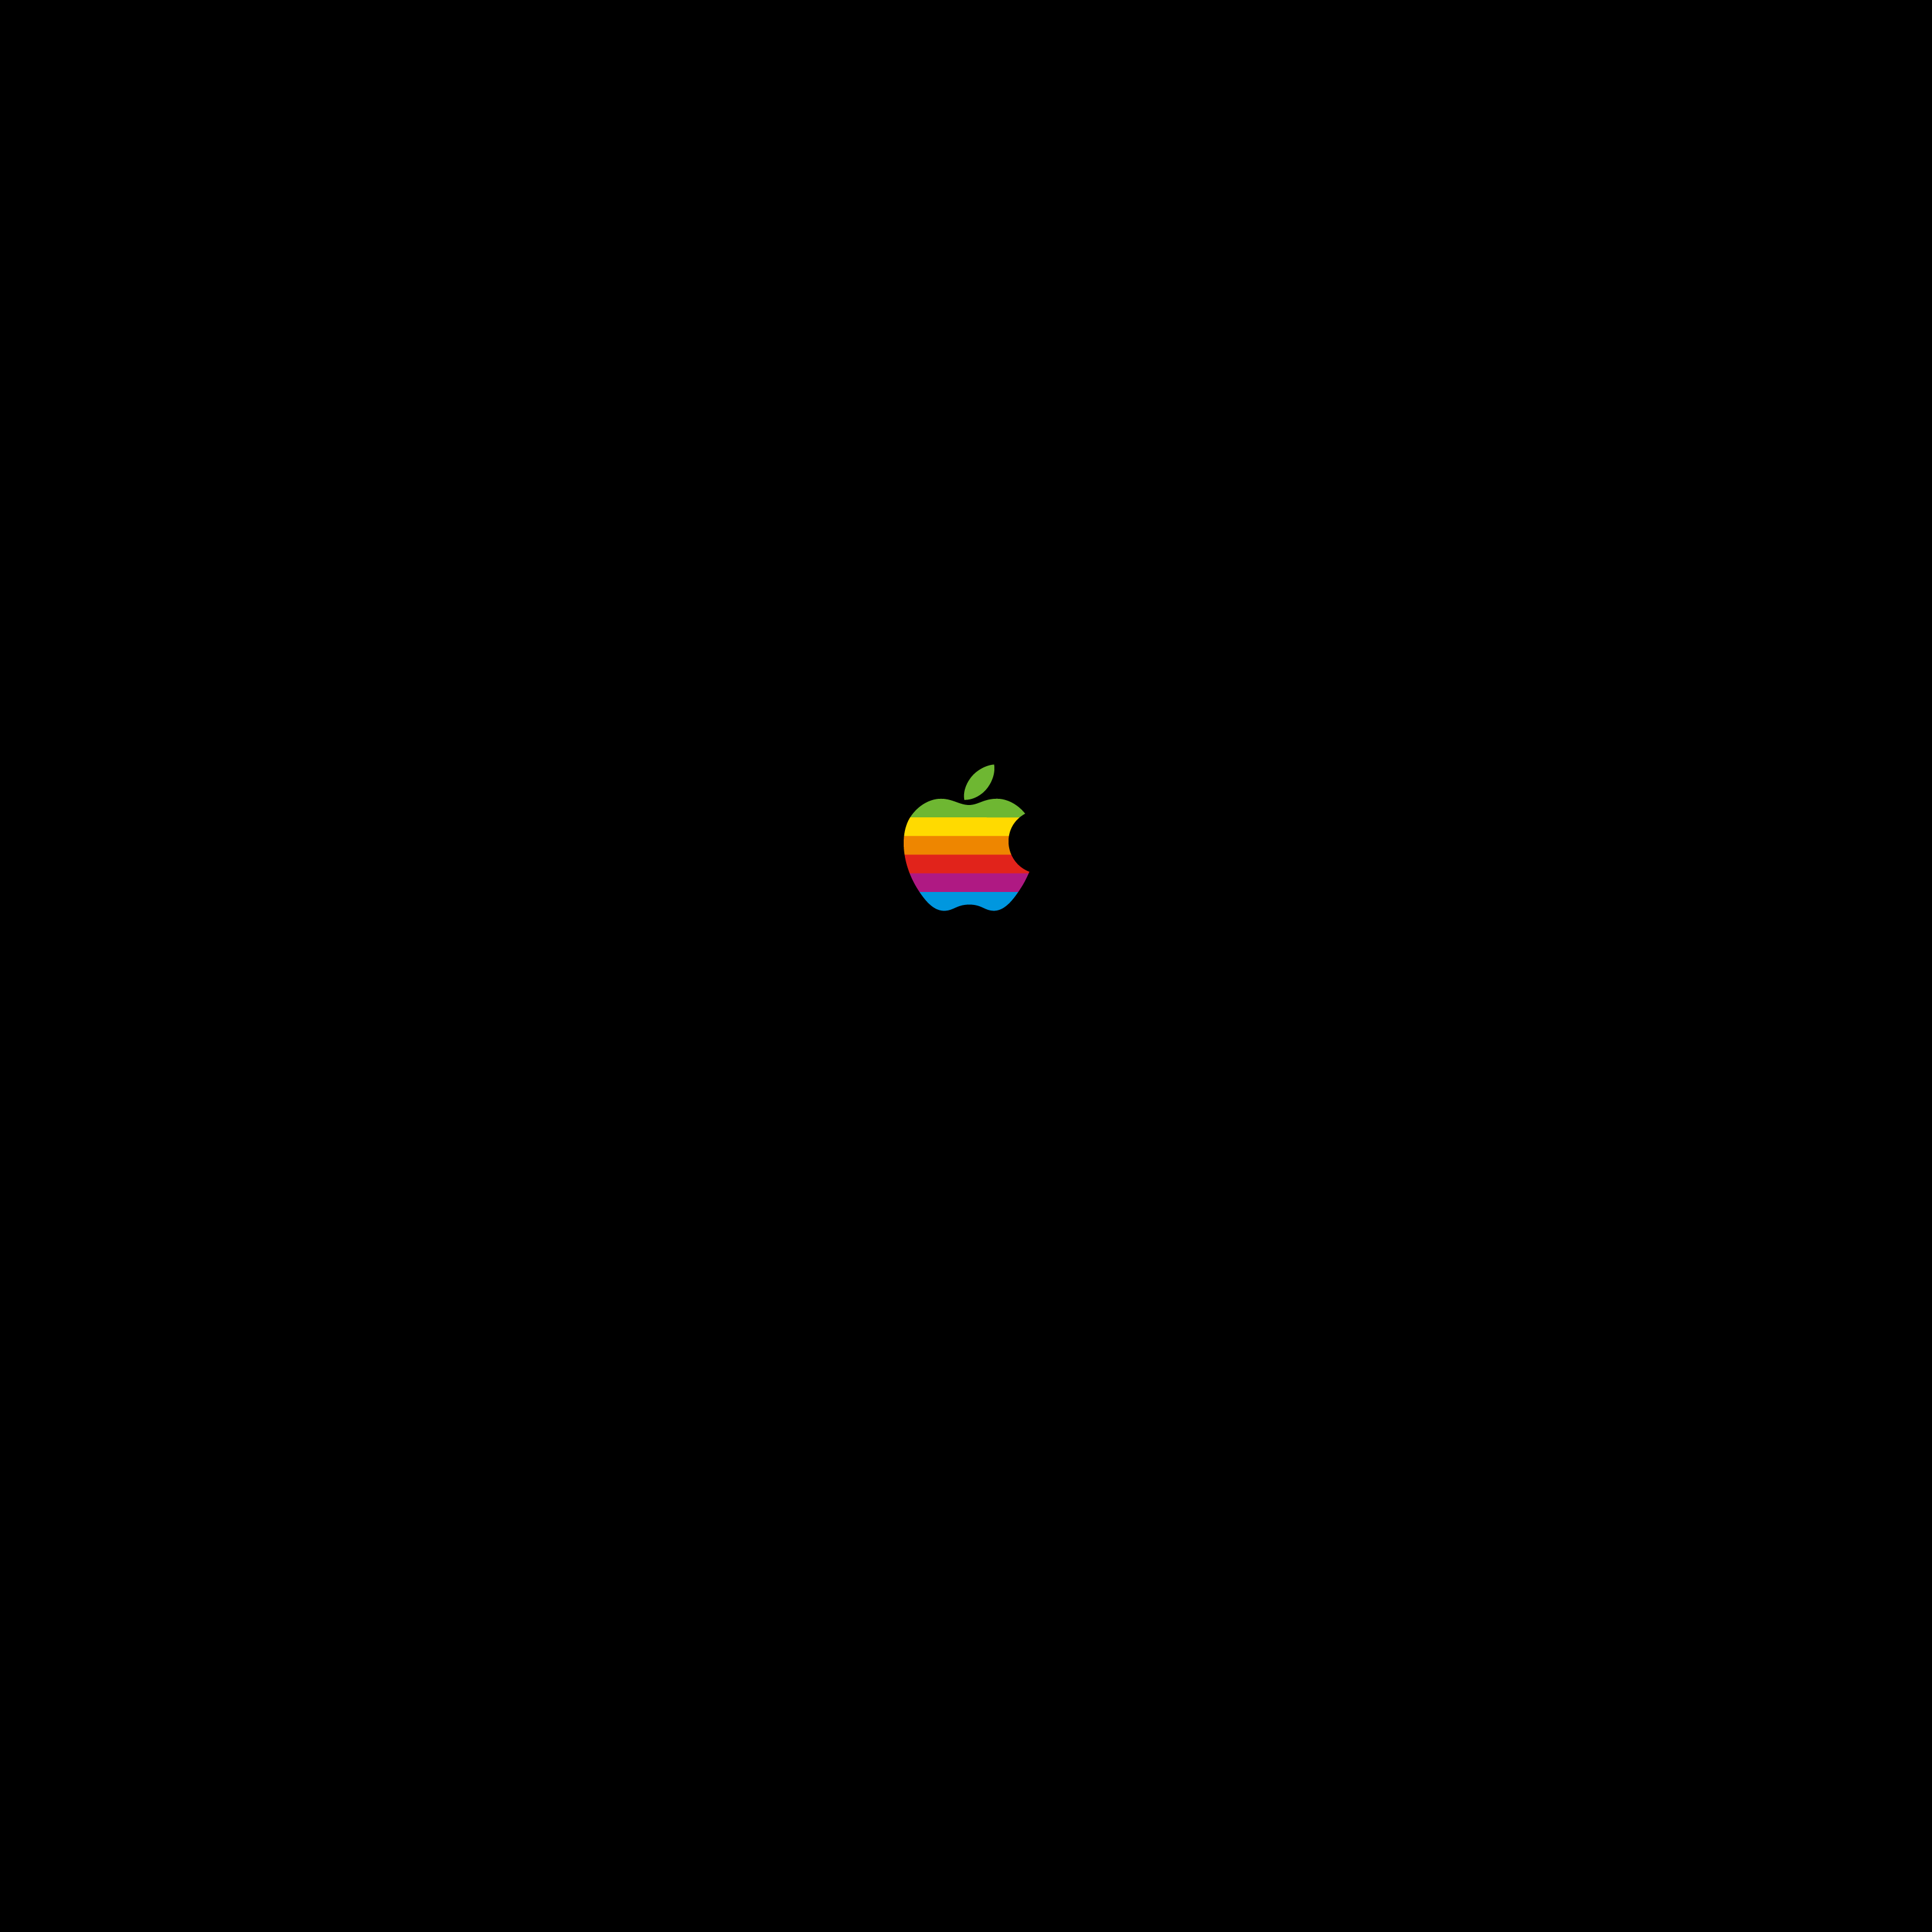 Appleレインボー壁紙 iPad, iPhone Plus(縦横) (1:1)